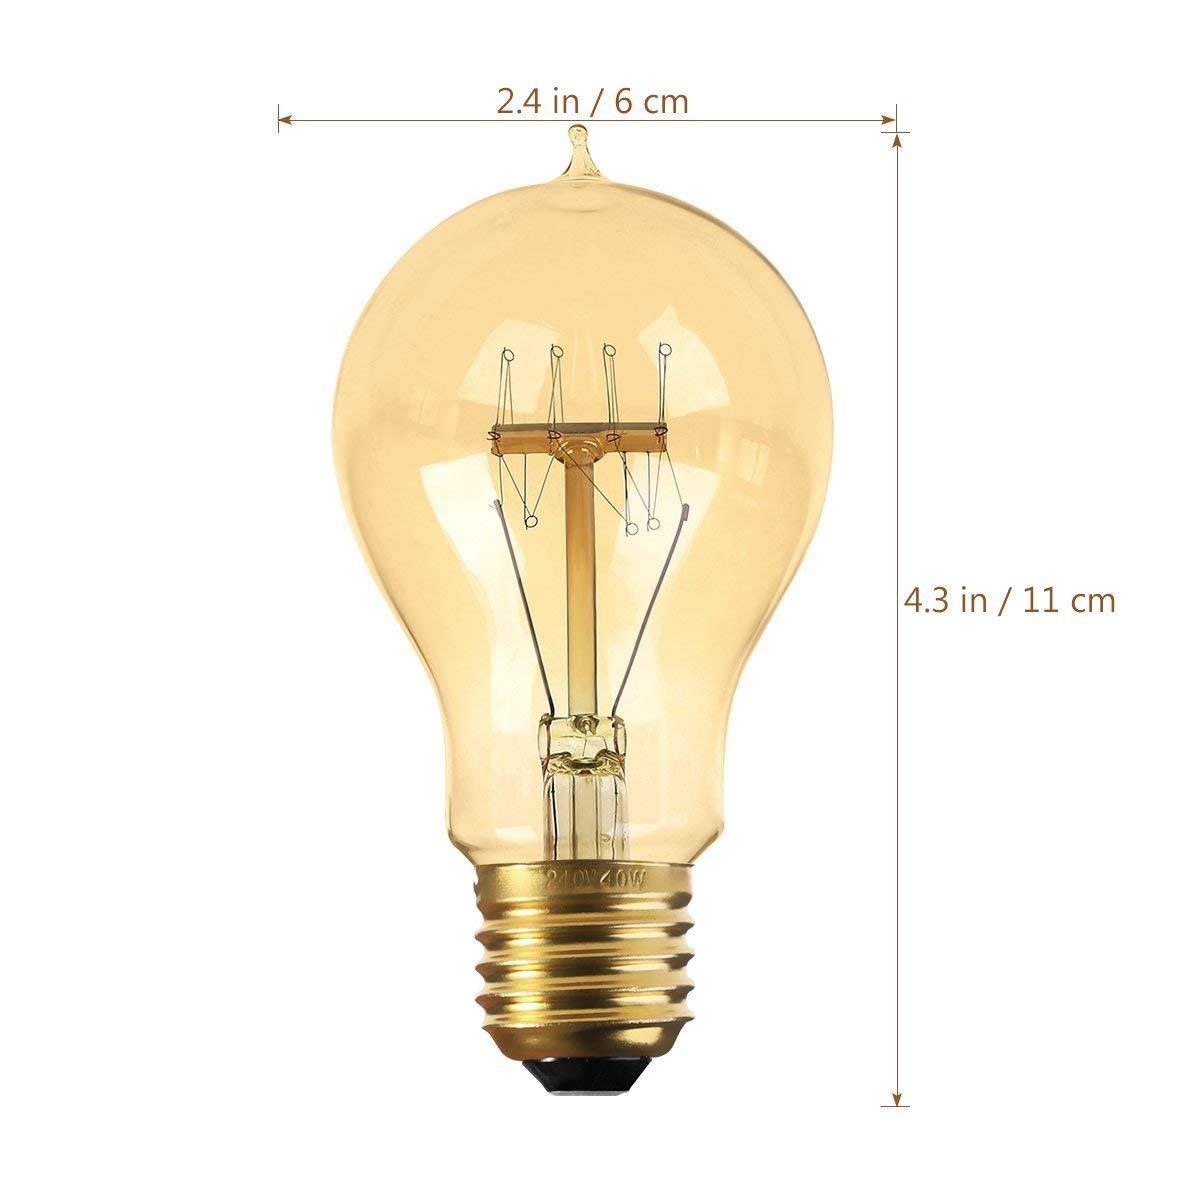 YUNLIGHTS A19 E27 Dimmbar Edison Gl/ühbirne im Vintage Stil 220-240V 40W 140lm Warmwei/ß Edison Lampe 2 St/ück